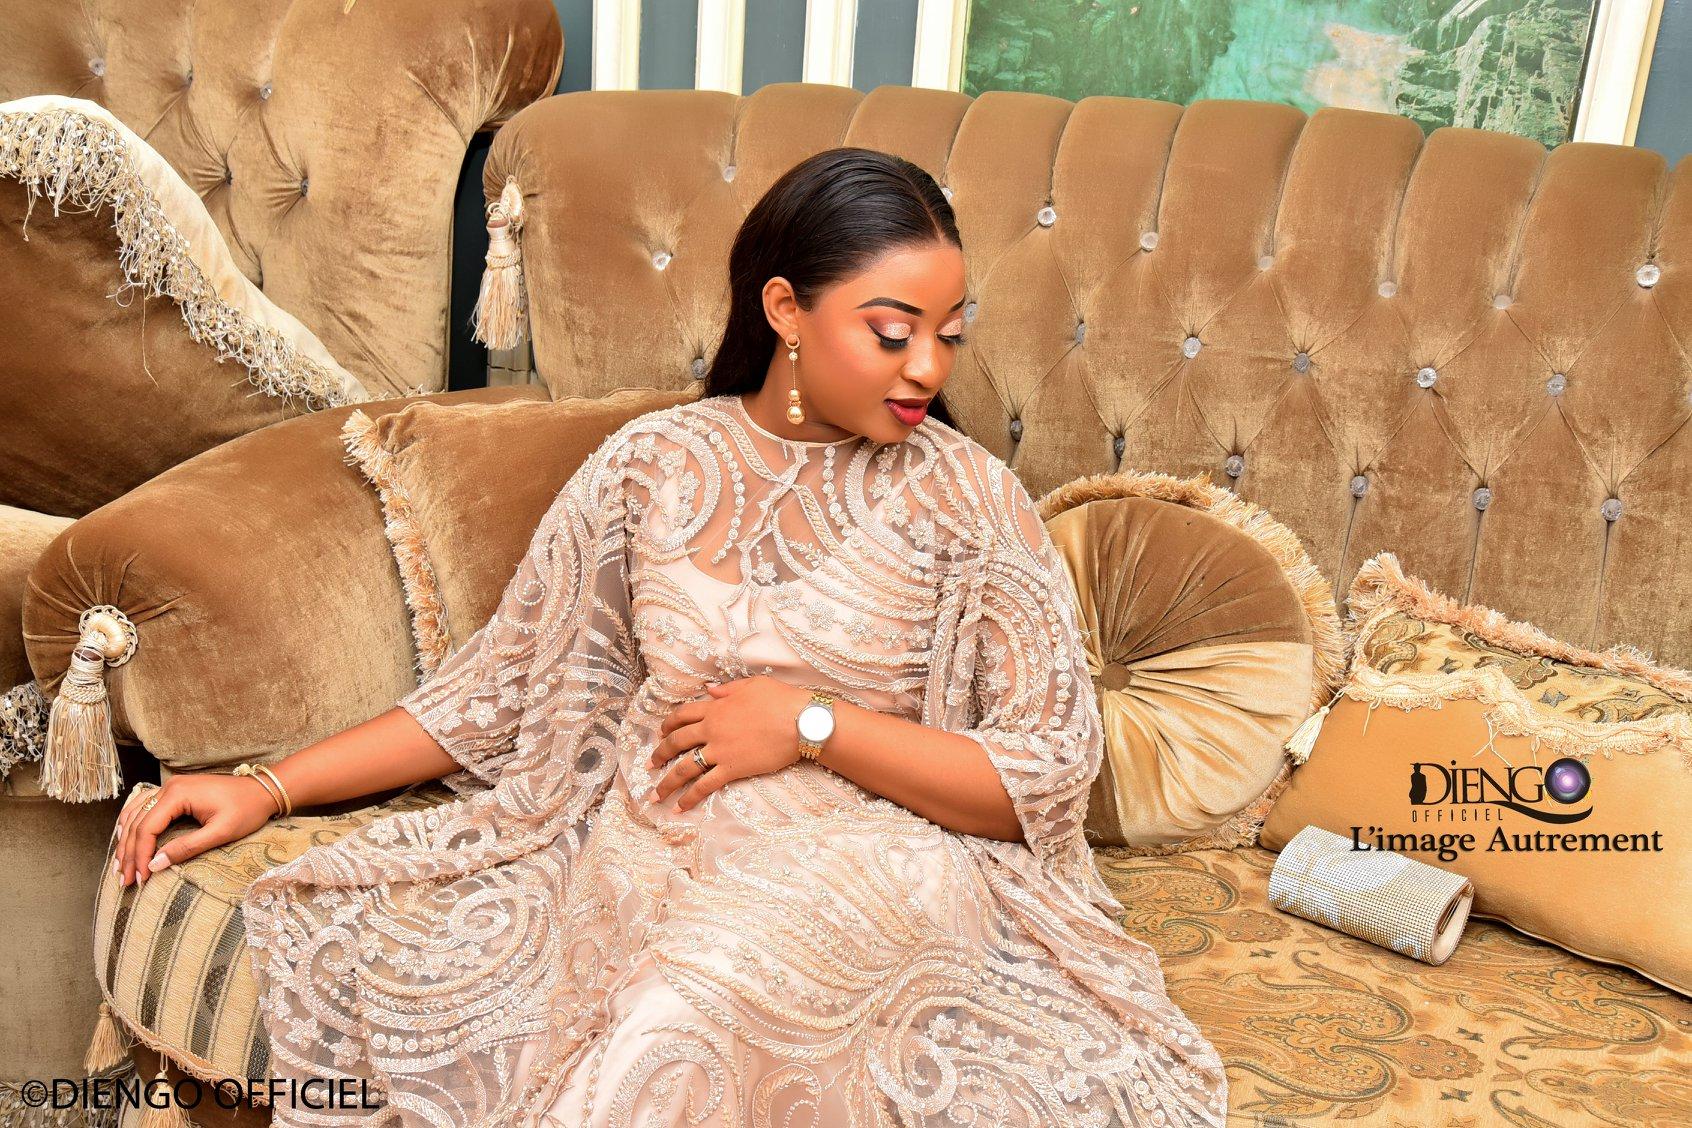 PHOTOS - Baptême: Jolie Fall illumine la toile avec ses tenues très classe